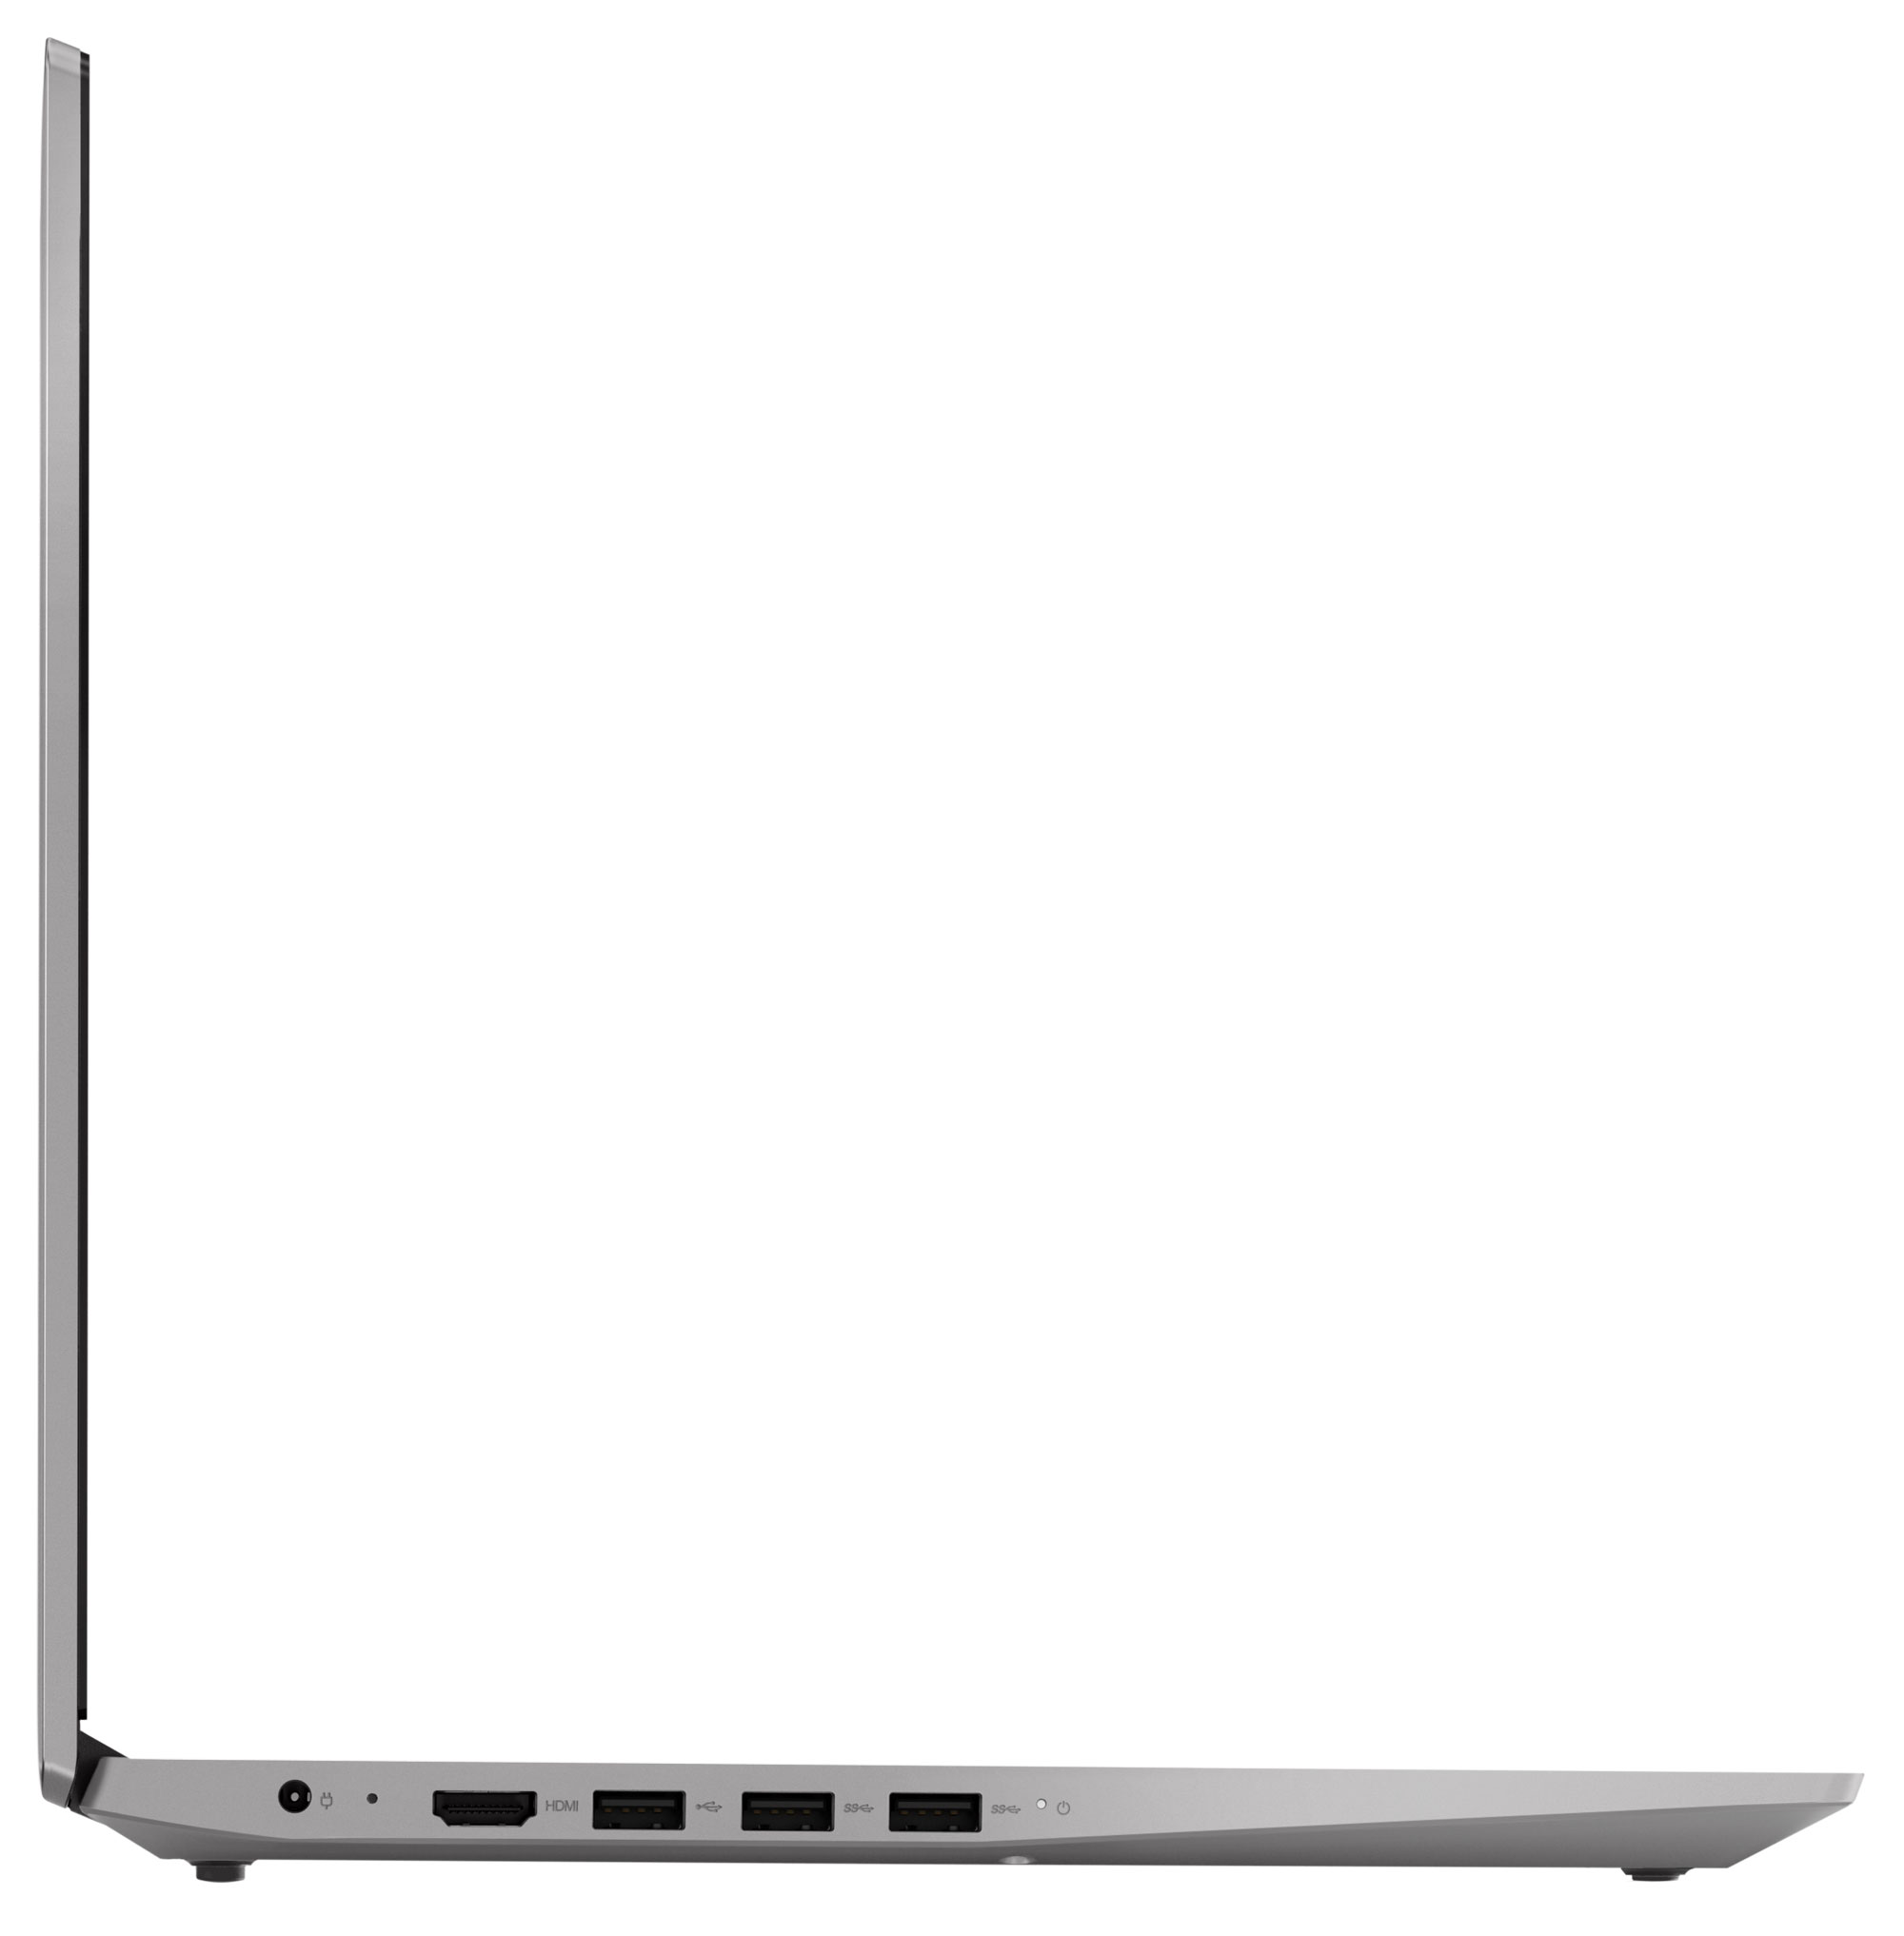 Фото  Ноутбук Lenovo ideapad S145-15IWL Grey (81MV01CKRE)